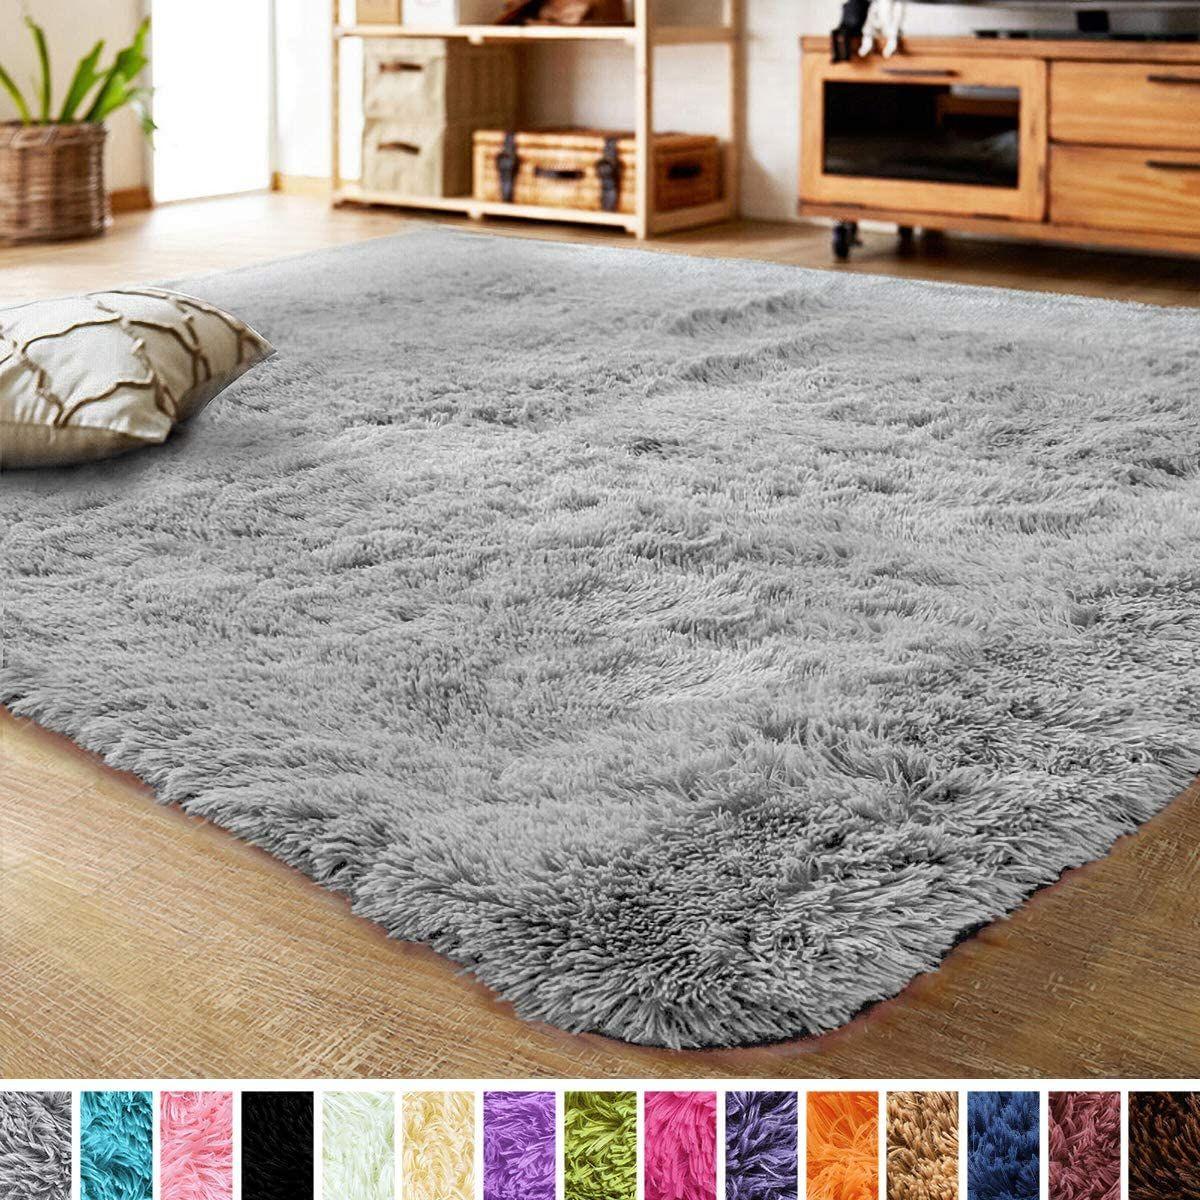 Lochas Ultra Soft Indoor Modern Area Rugs Fluffy Living Room Carpets For Children Bedroom Home Decor In 2020 Living Room Carpet Room Carpet Fluffy Rug